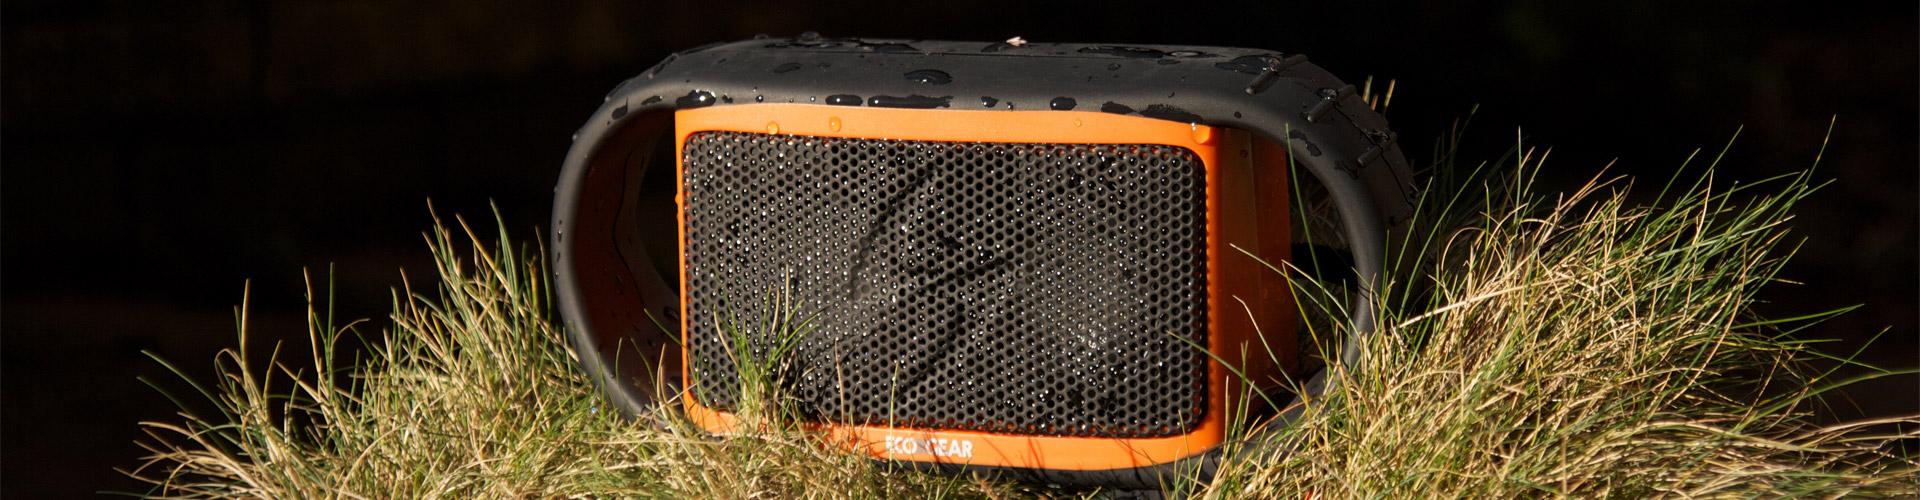 ECOXGEAR ECXOBT Speaker Review: Rugged Build, Big Sound